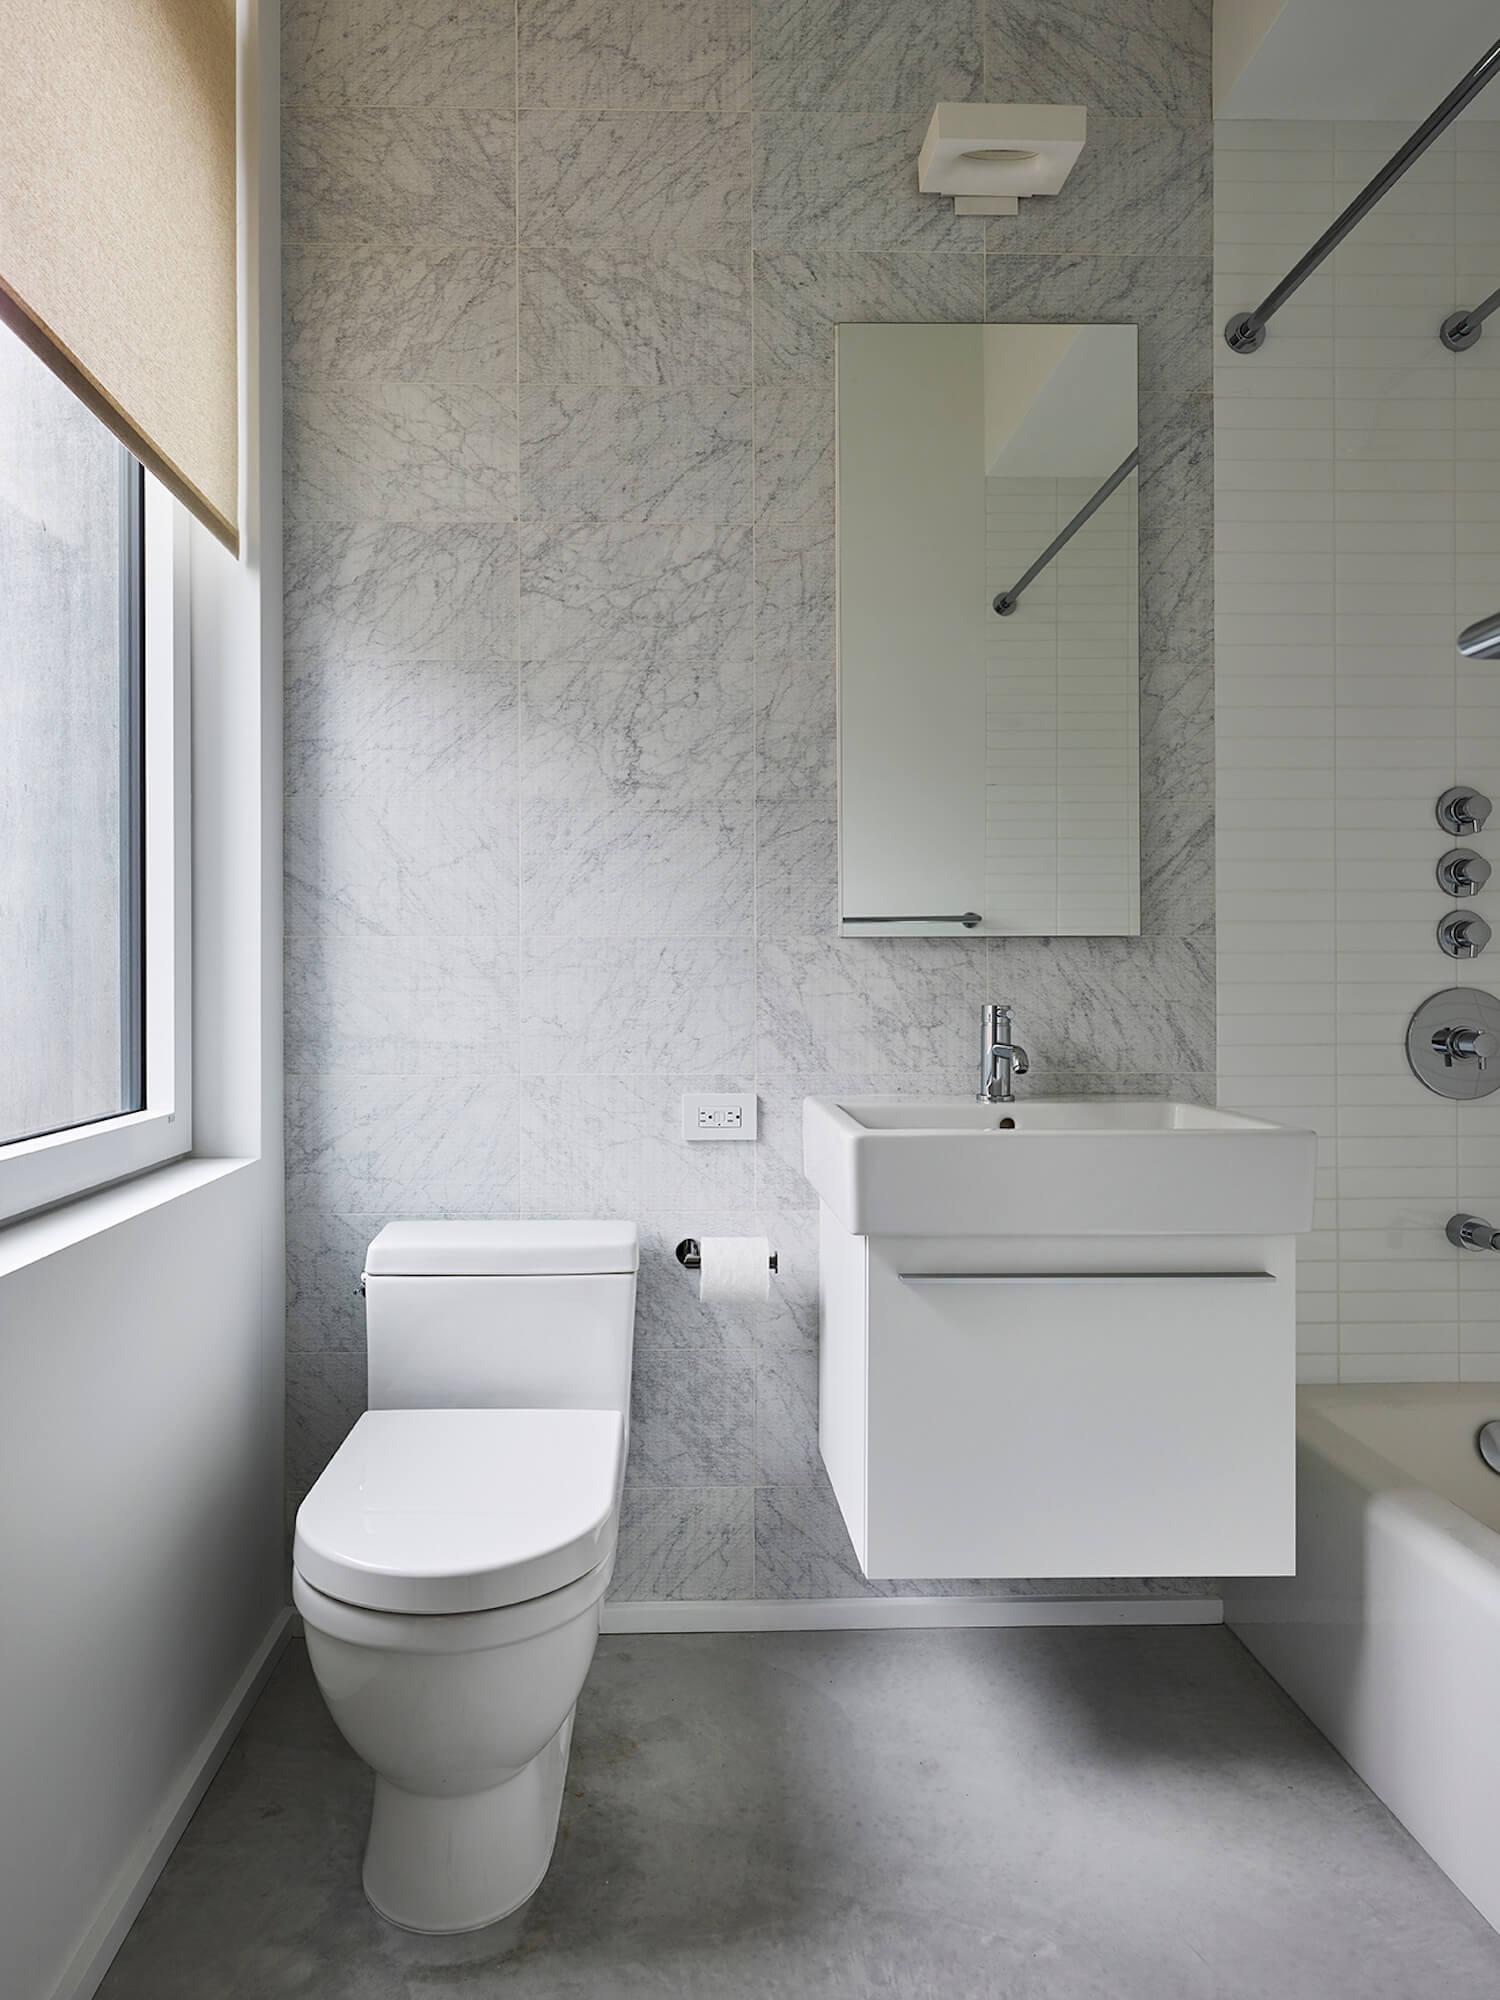 est living global interiors river loft robert young architects RRA 12 LAIGHT F.OUDEMAN 2015 ¬ 14